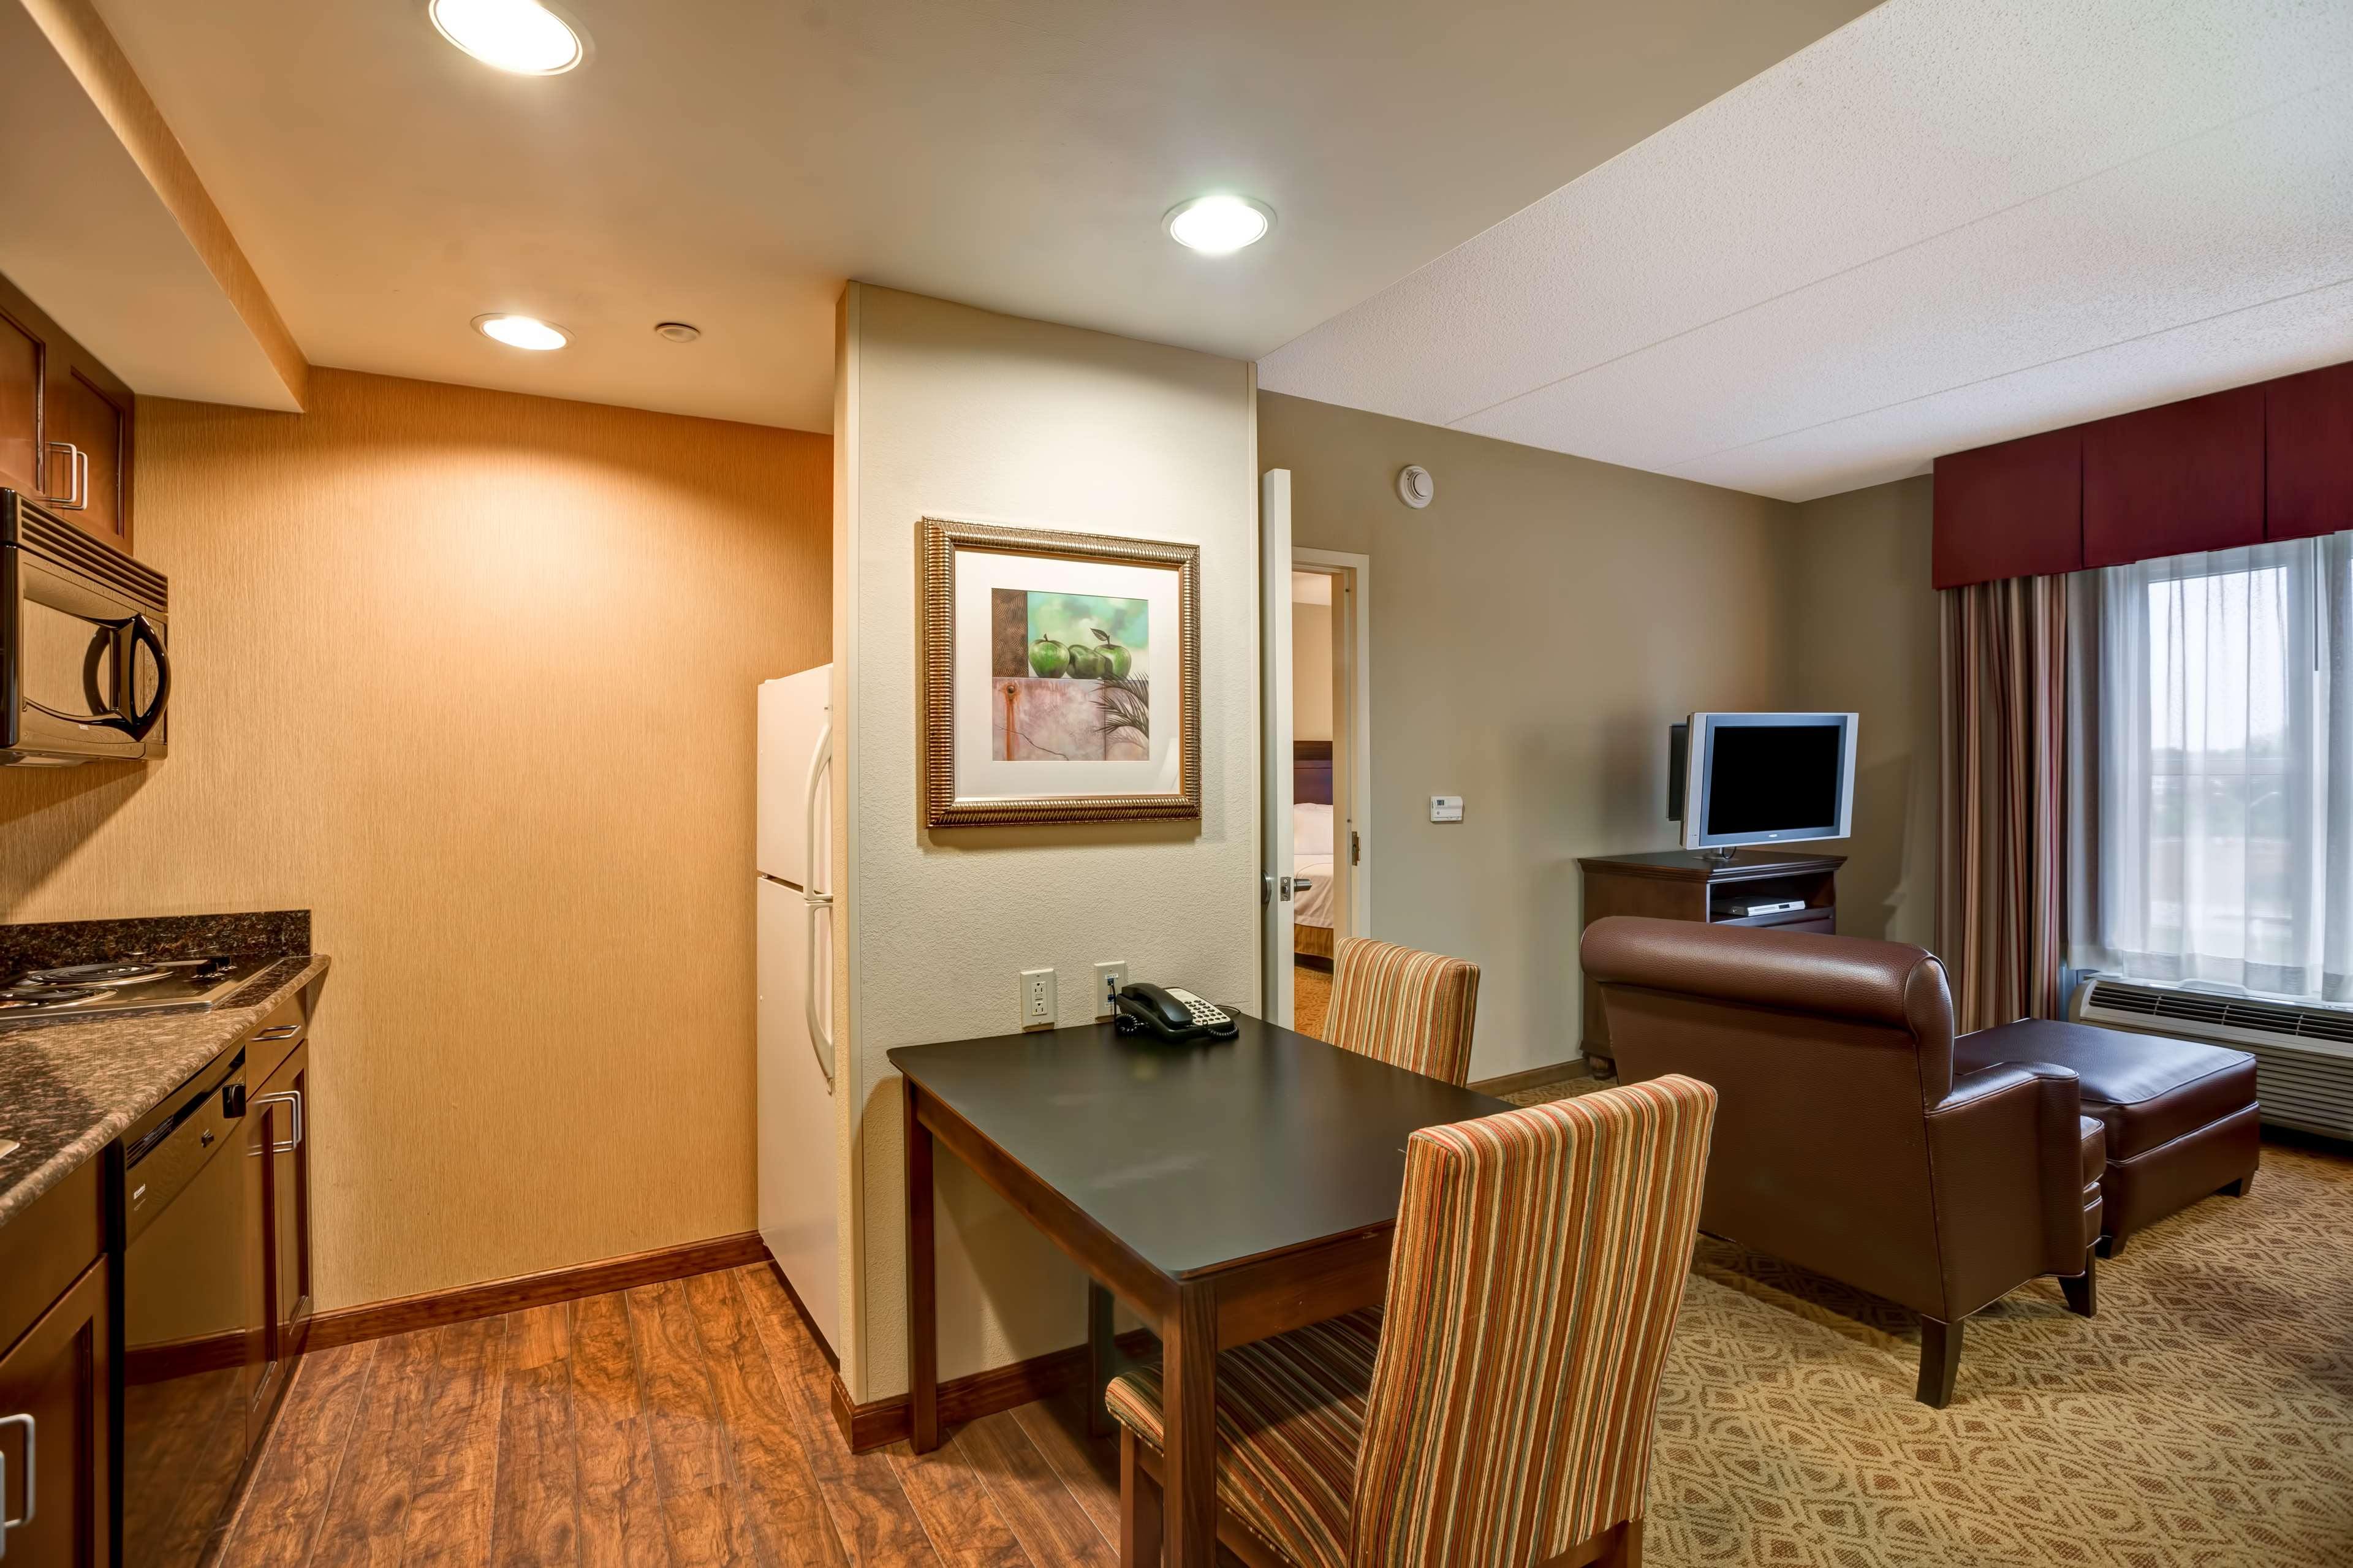 Homewood Suites by Hilton Fredericksburg image 29